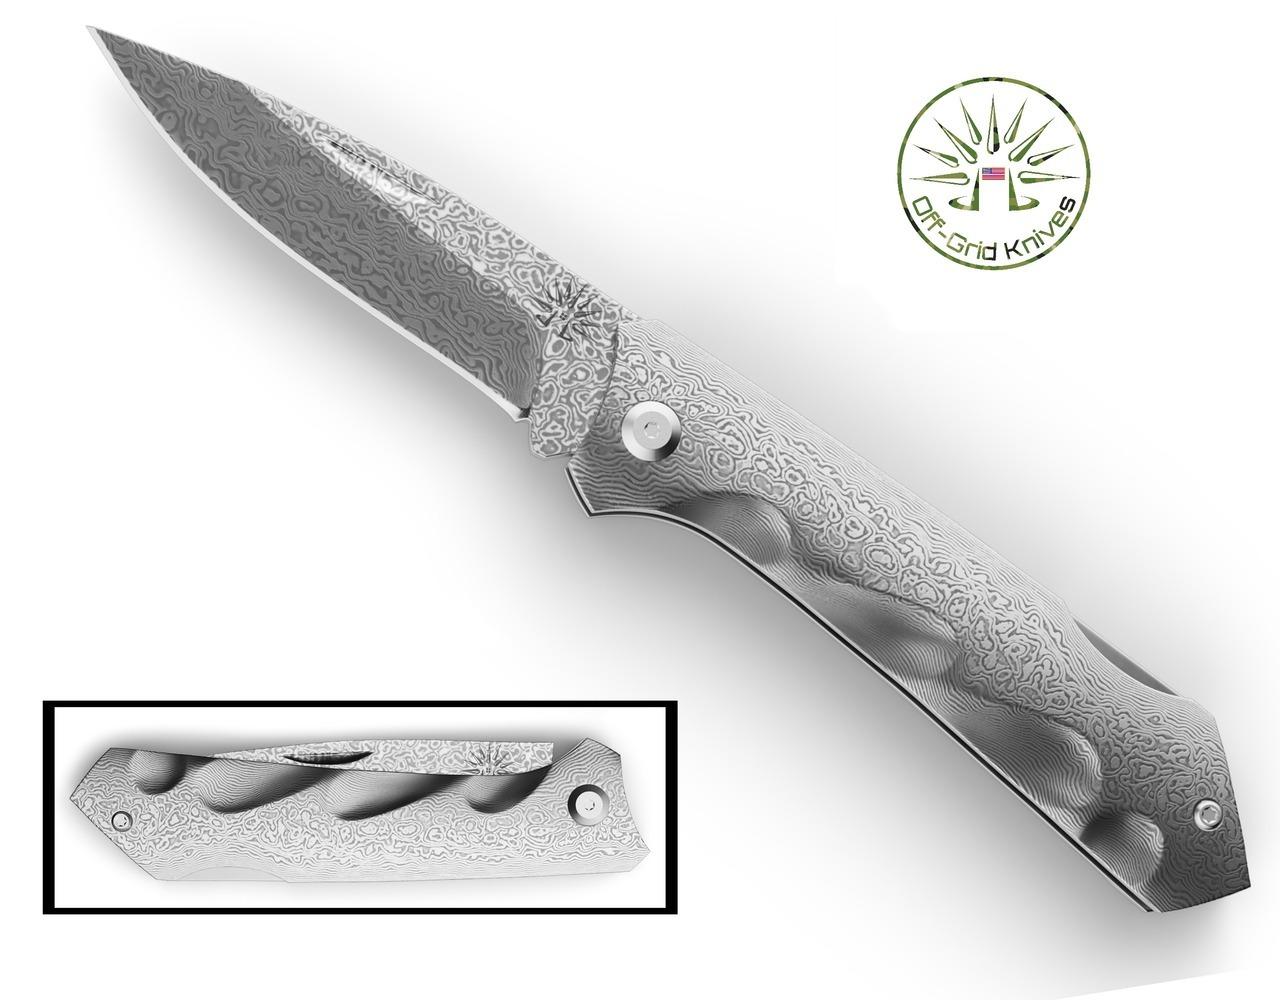 pocket-carry-folding-knives-for-sale